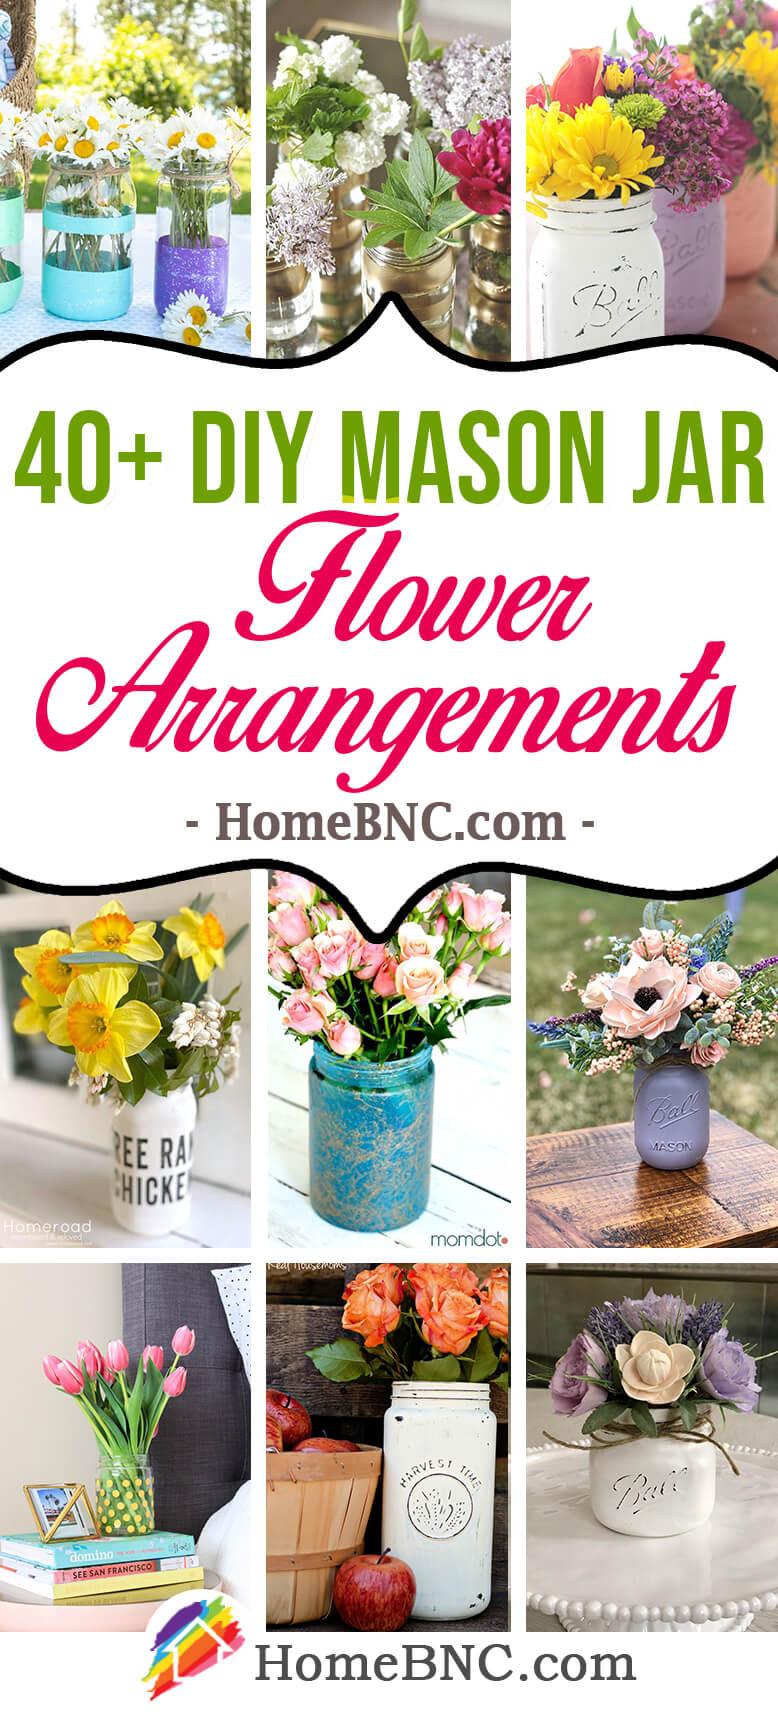 DIY Mason Jar Flower Arrangement Ideas